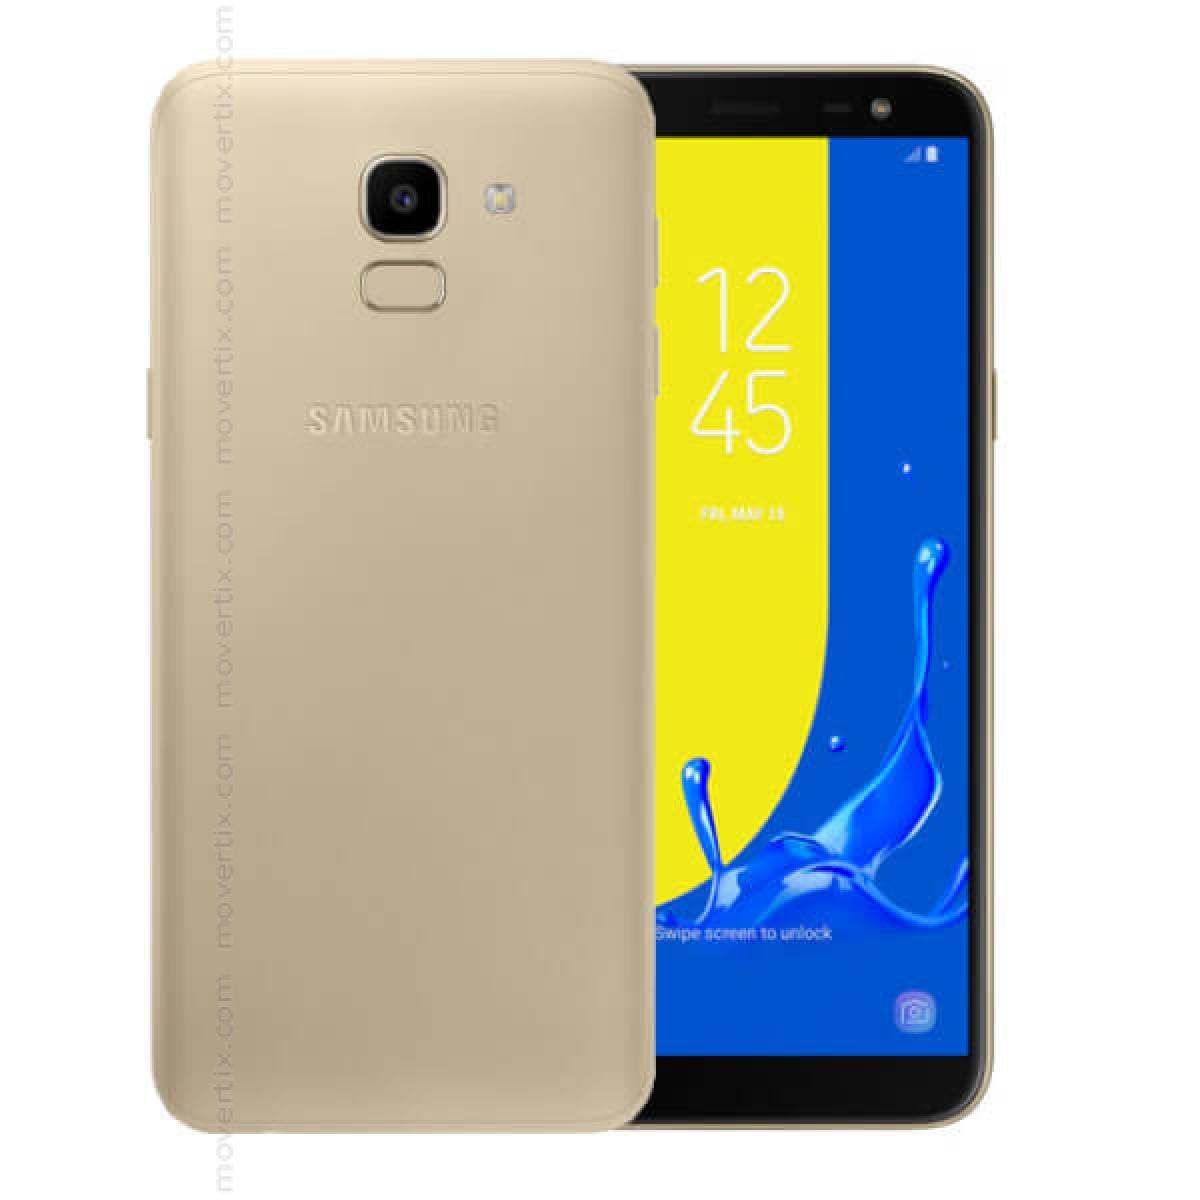 bcfed9960bc Samsung Galaxy J6 (2018) Gold 32GB and 3GB RAM - SM-J600F ...